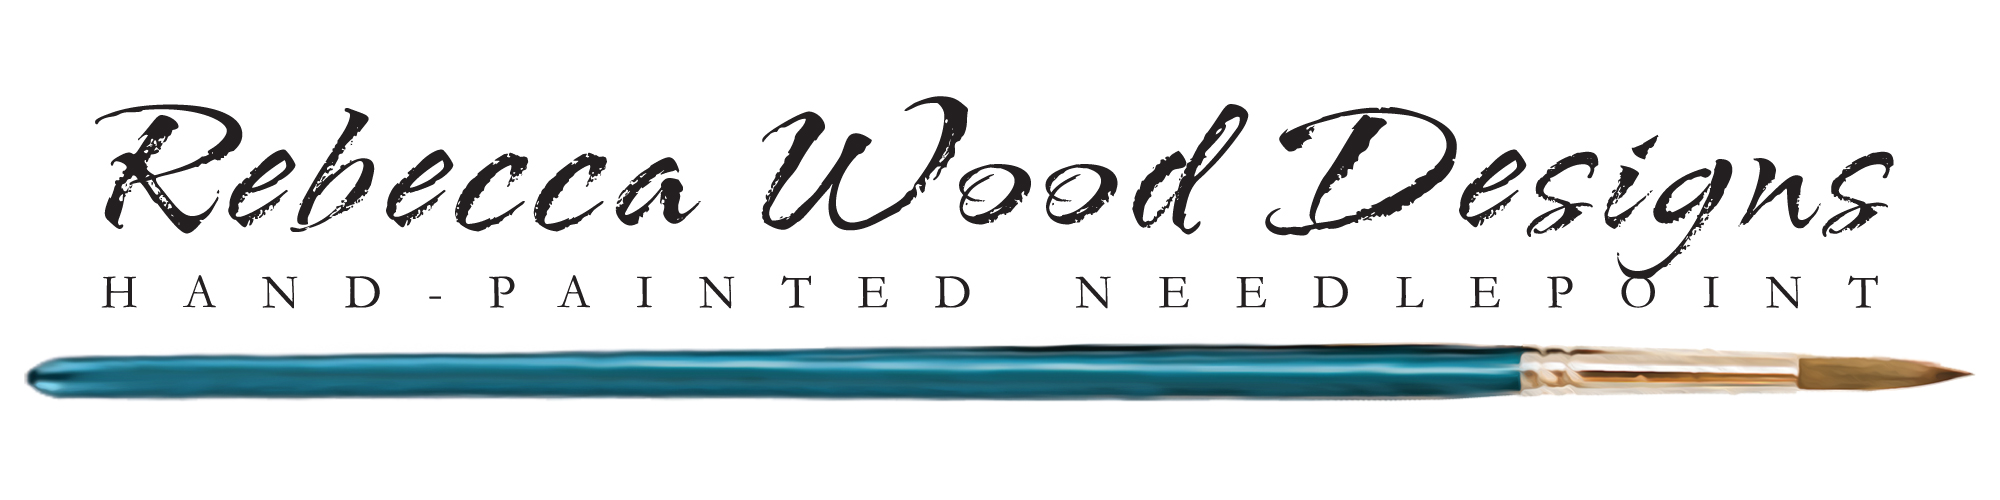 Rebecca Wood Design website